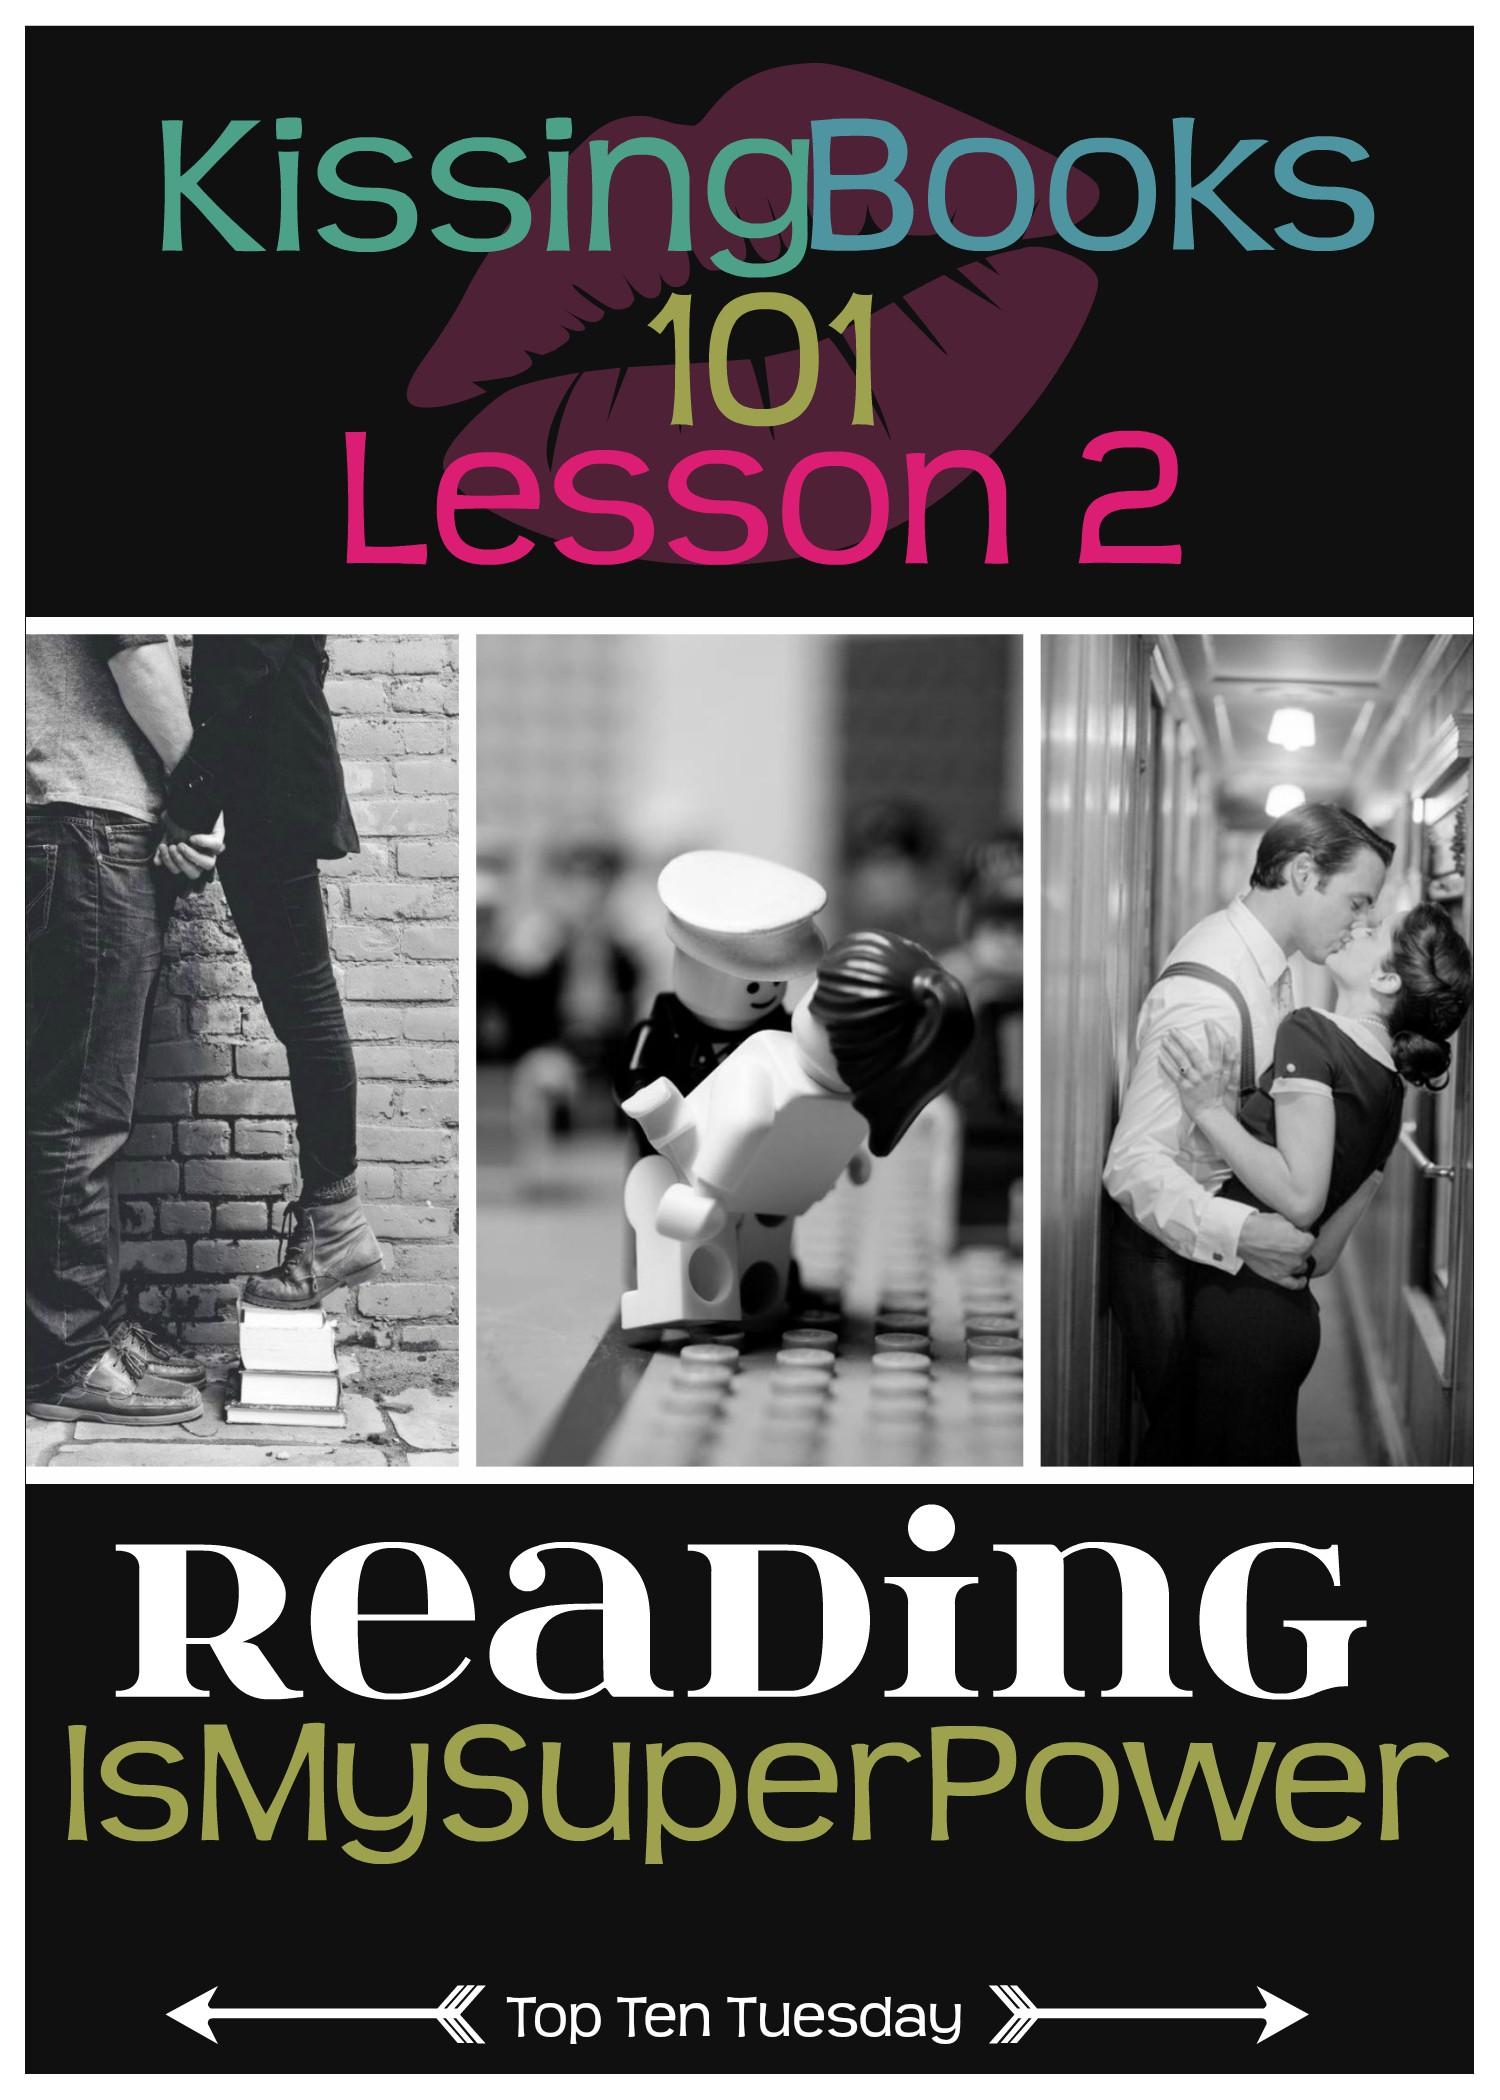 kissingbooks 101 lesson 2 title